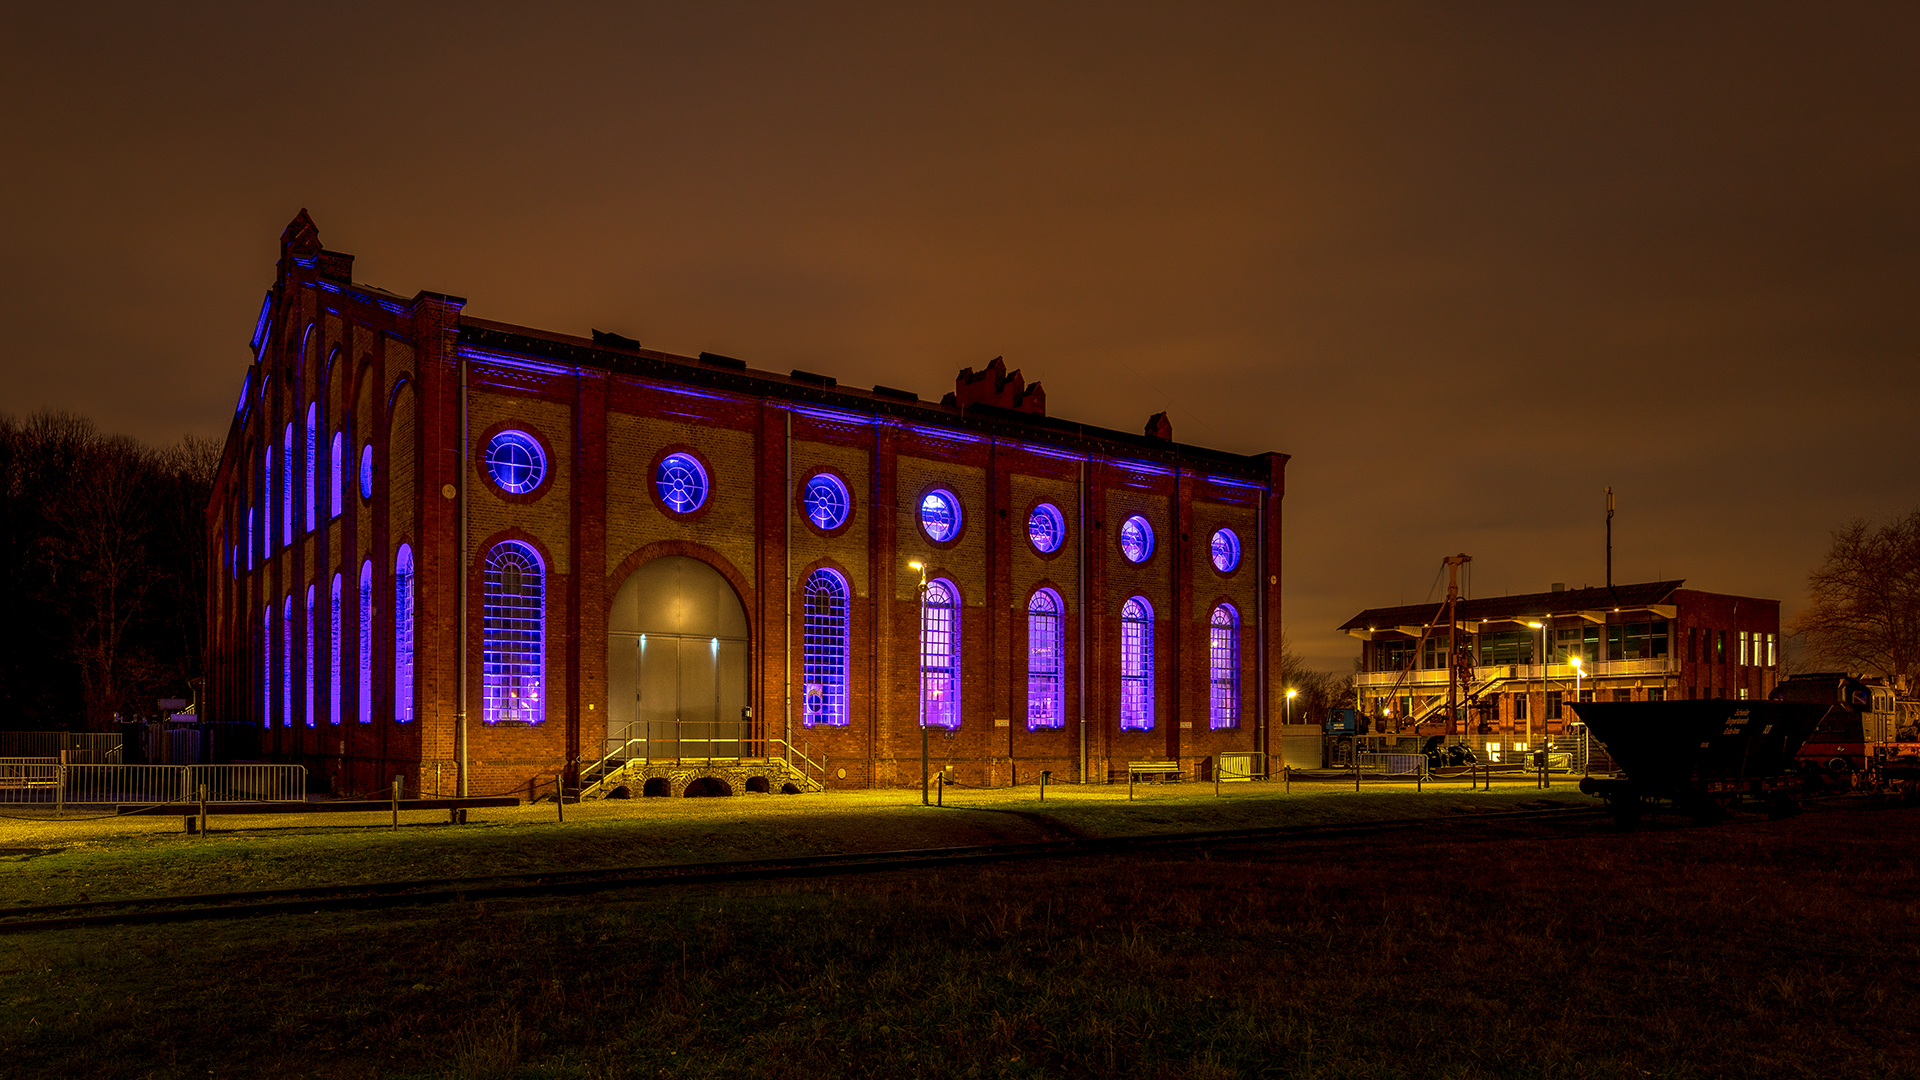 Energeticon Aachen